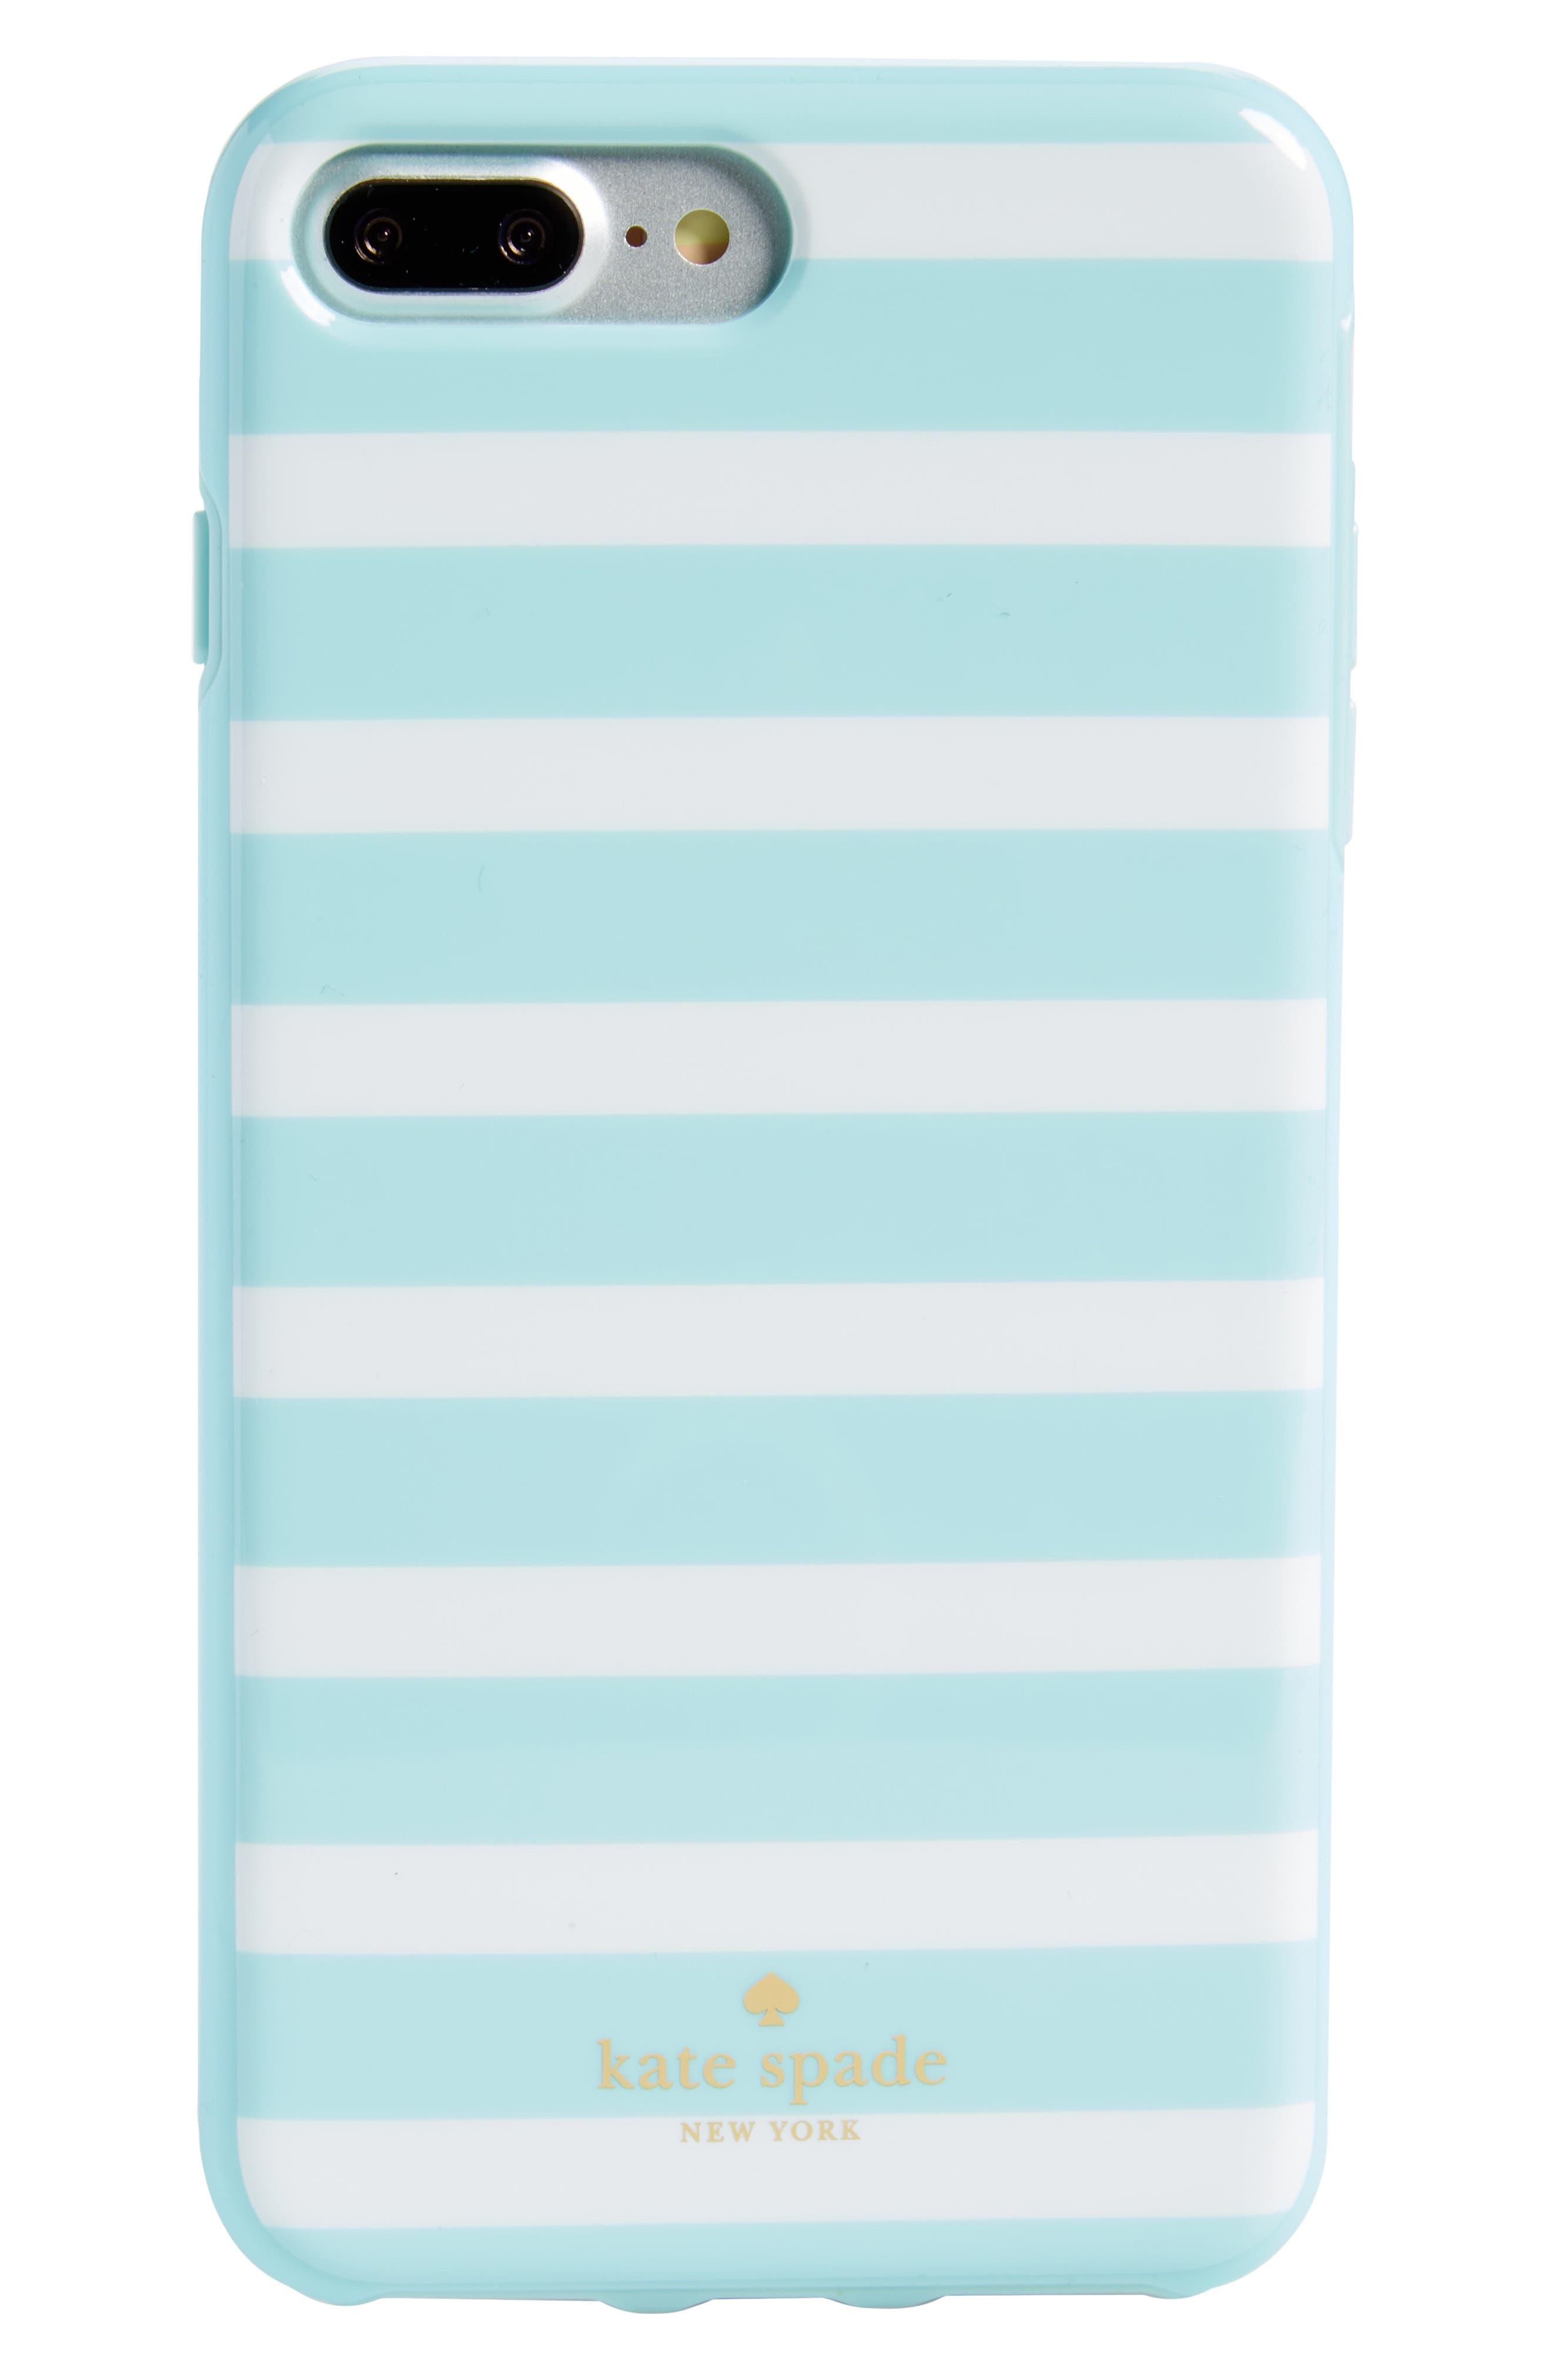 KATE SPADE NEW YORK fairmount square stripe iPhone